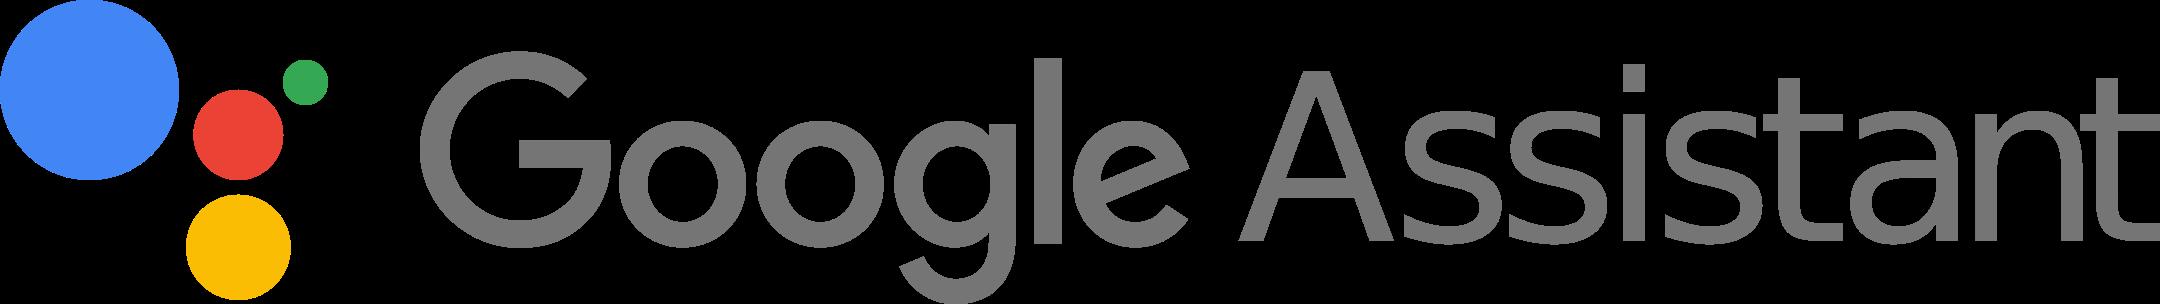 google assistant logo 1 - Google Assistant Logo